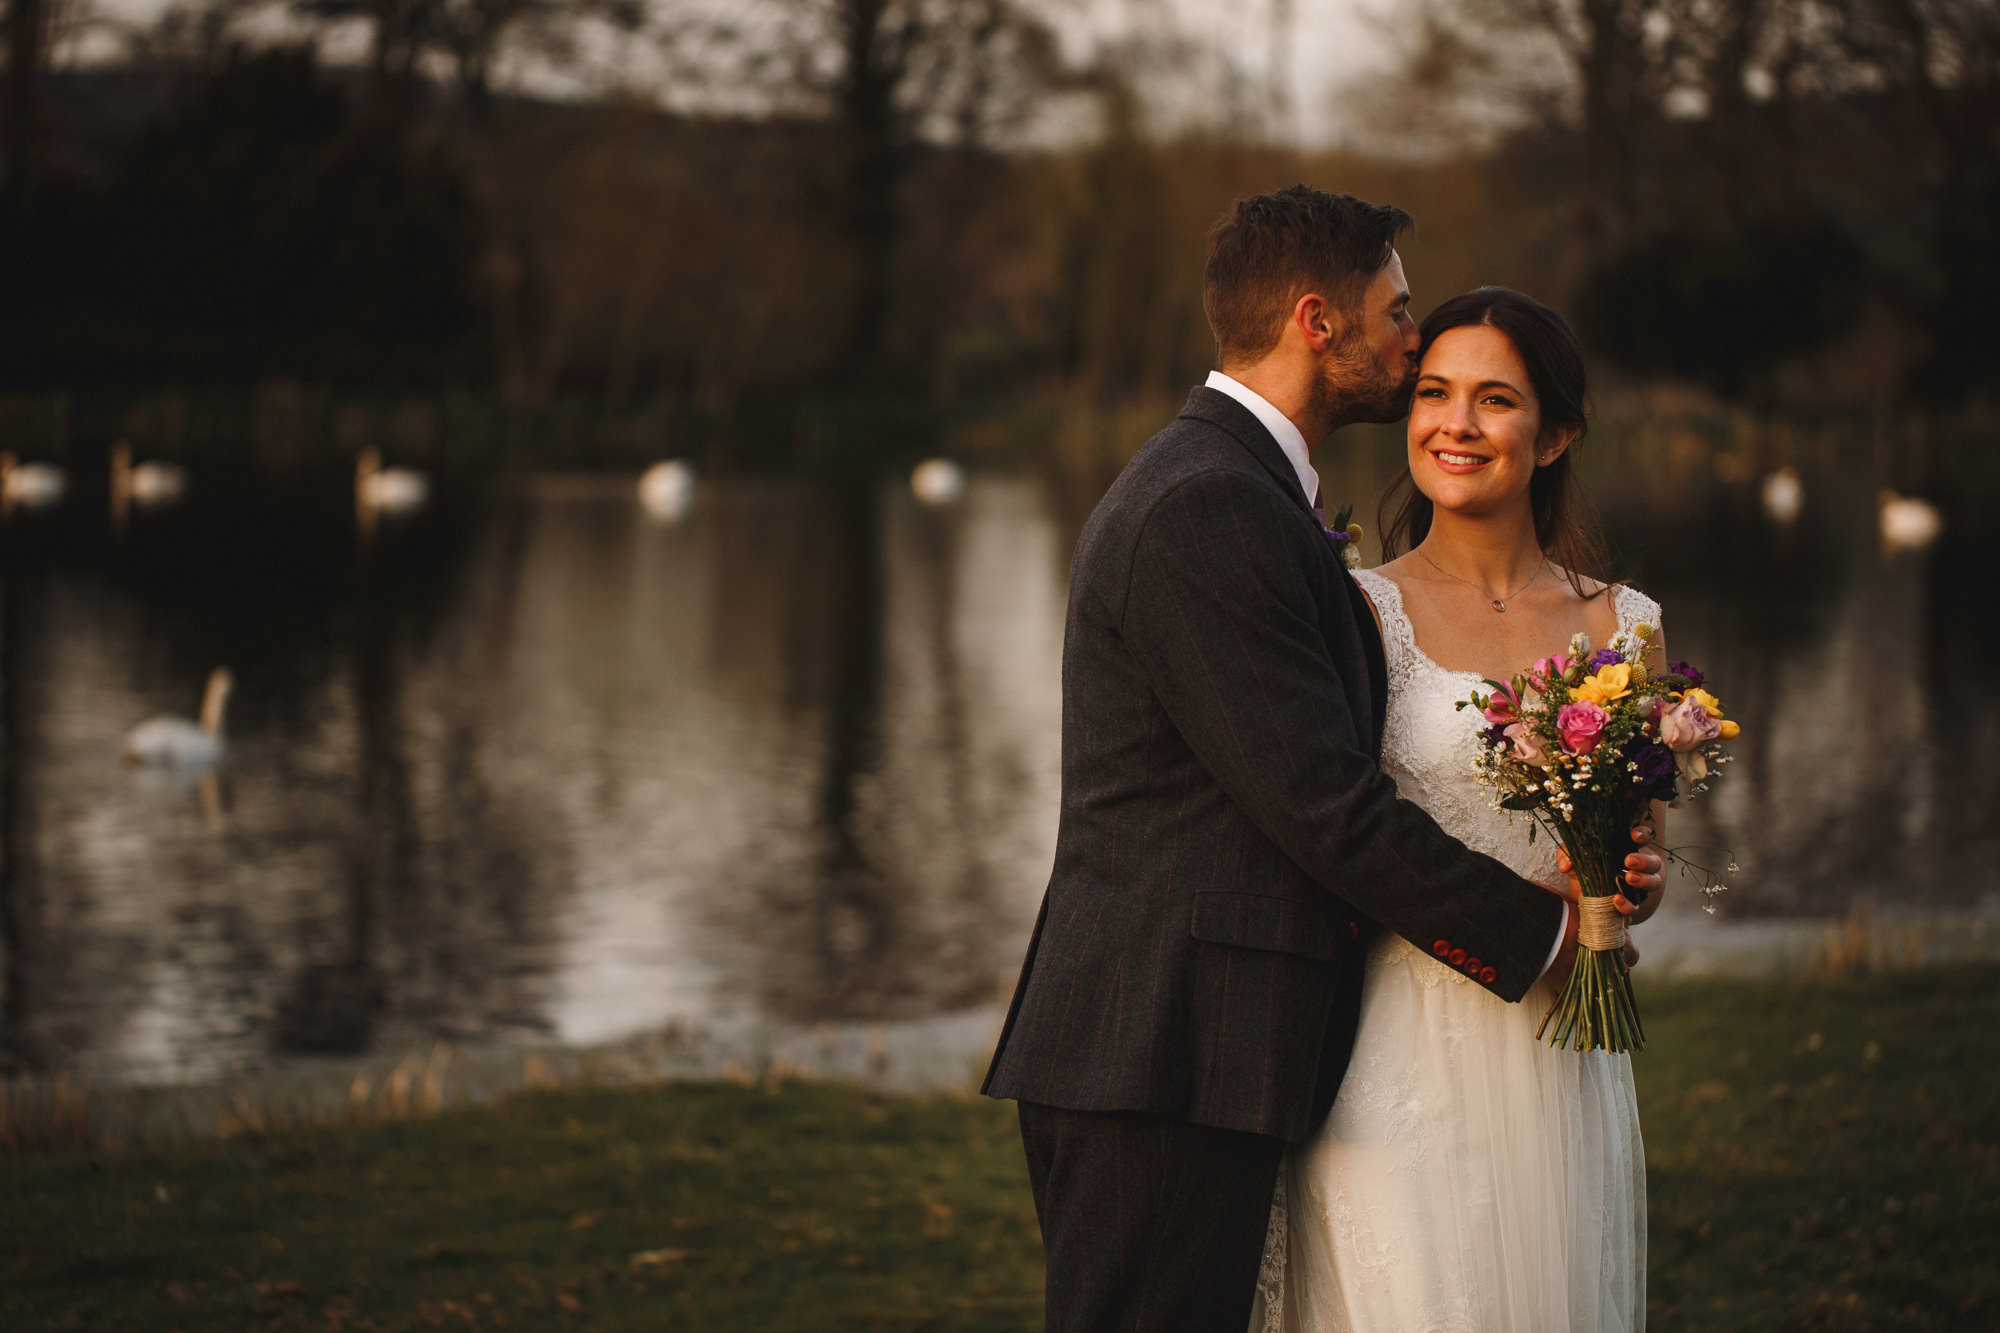 Walcot hall wedding photography shropshire 39